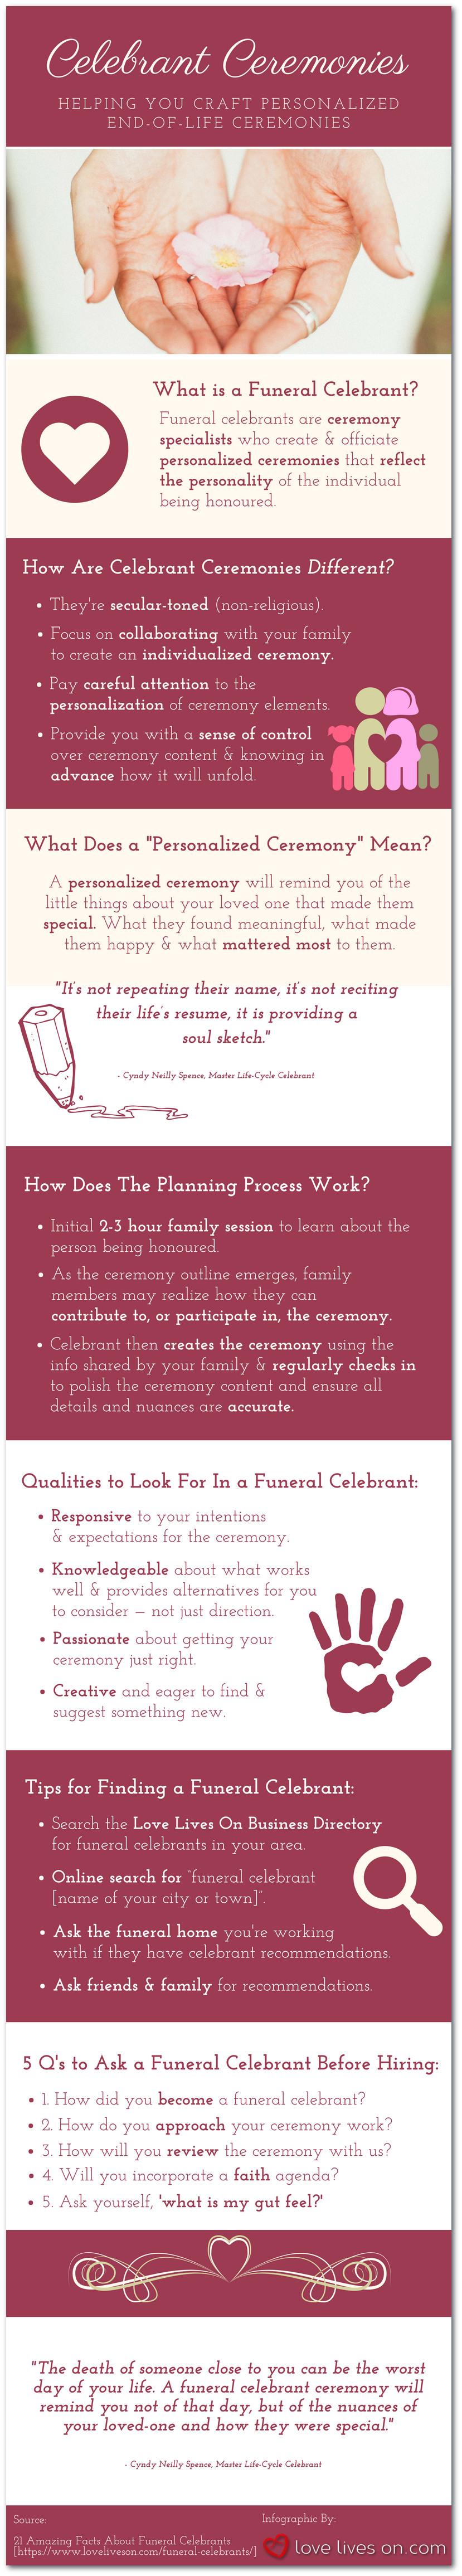 Funeral Celebrant Ceremonies